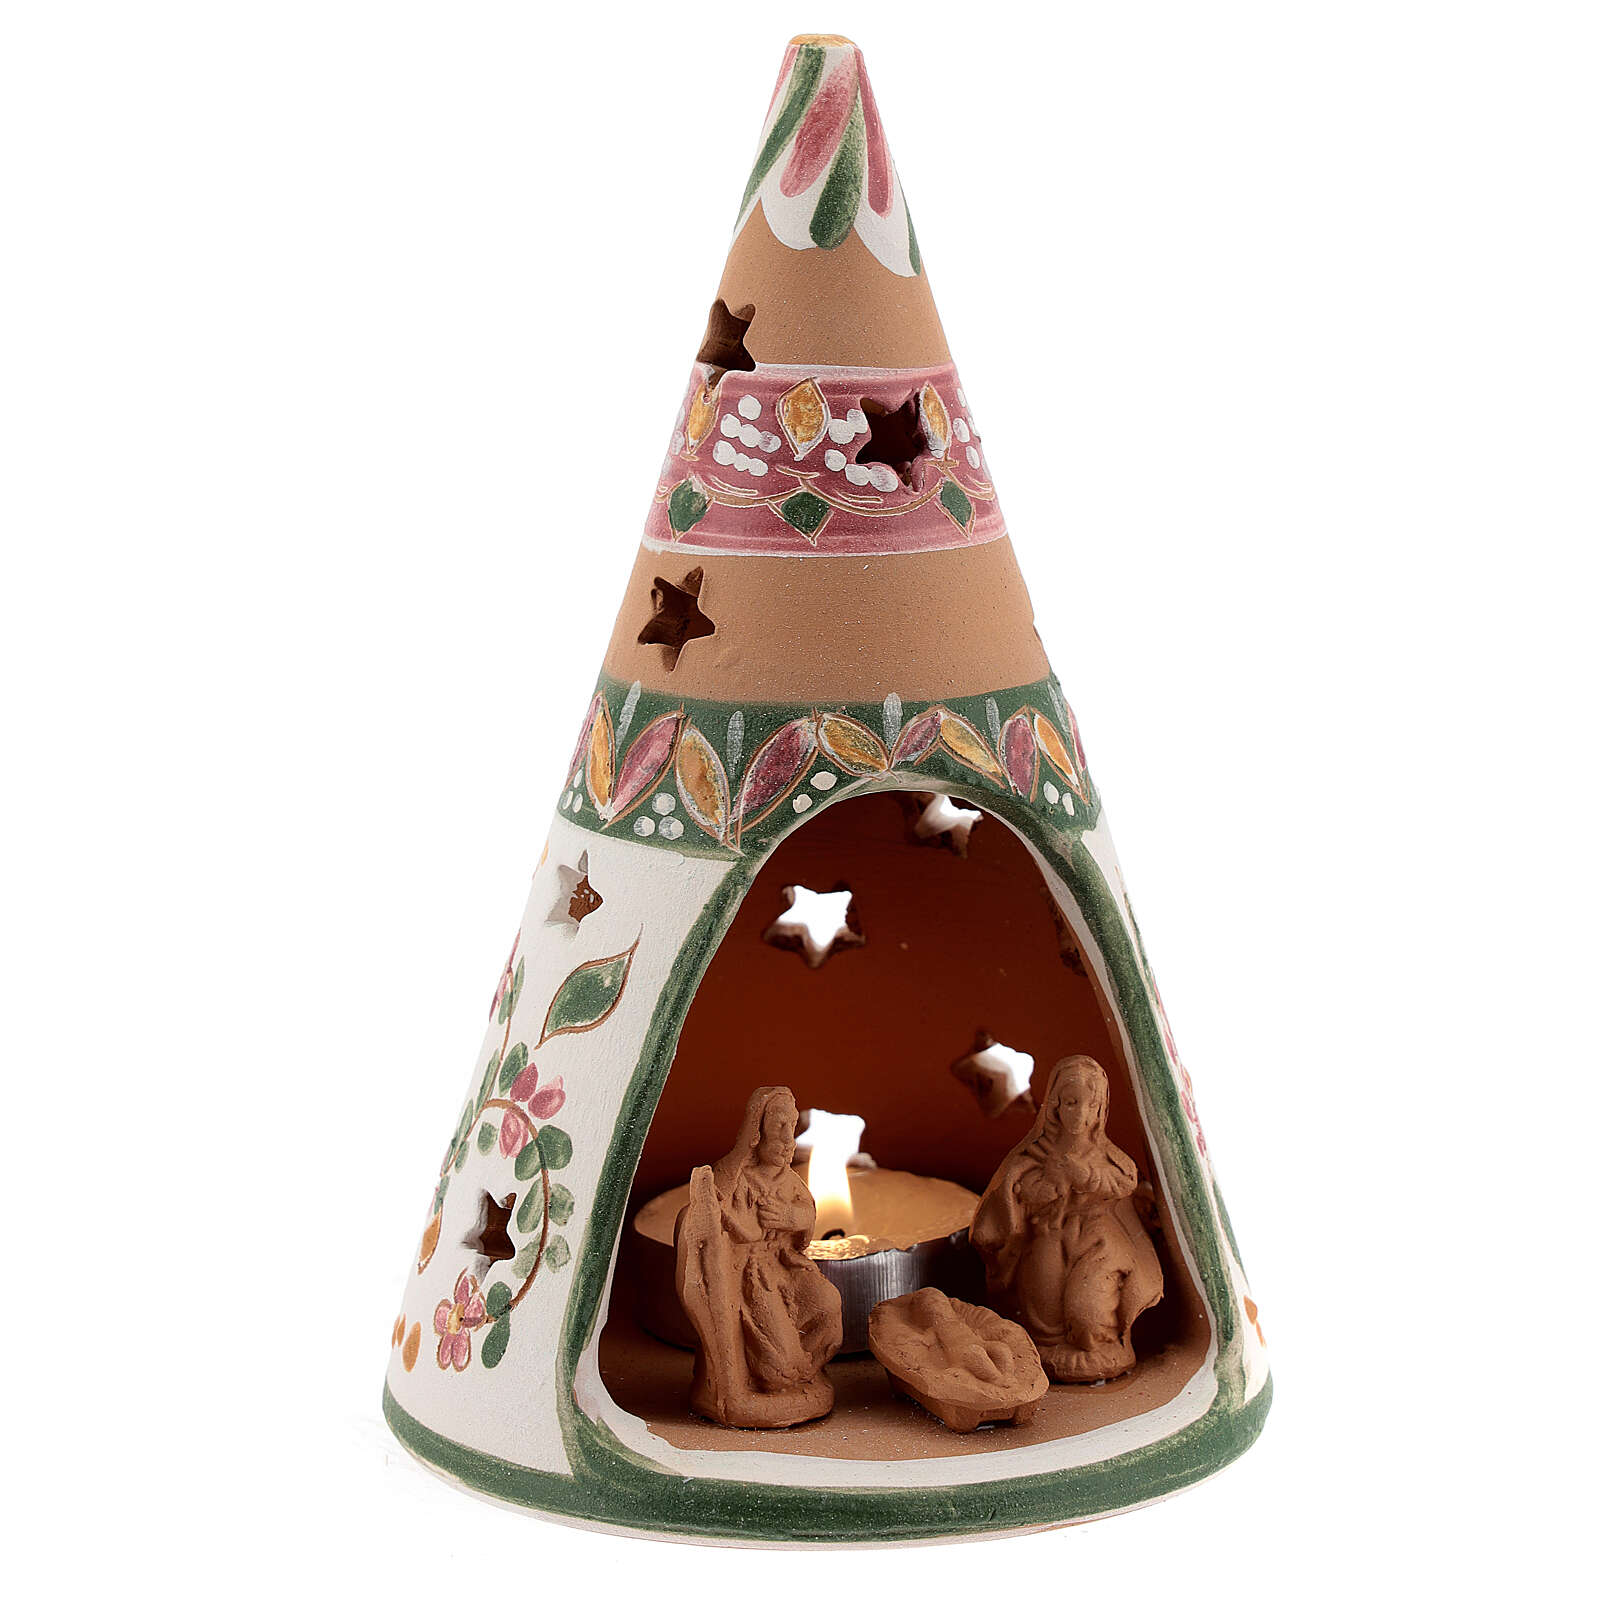 Cone Holy Family set natural terracotta tealight Deruta 15 cm pink decor 4